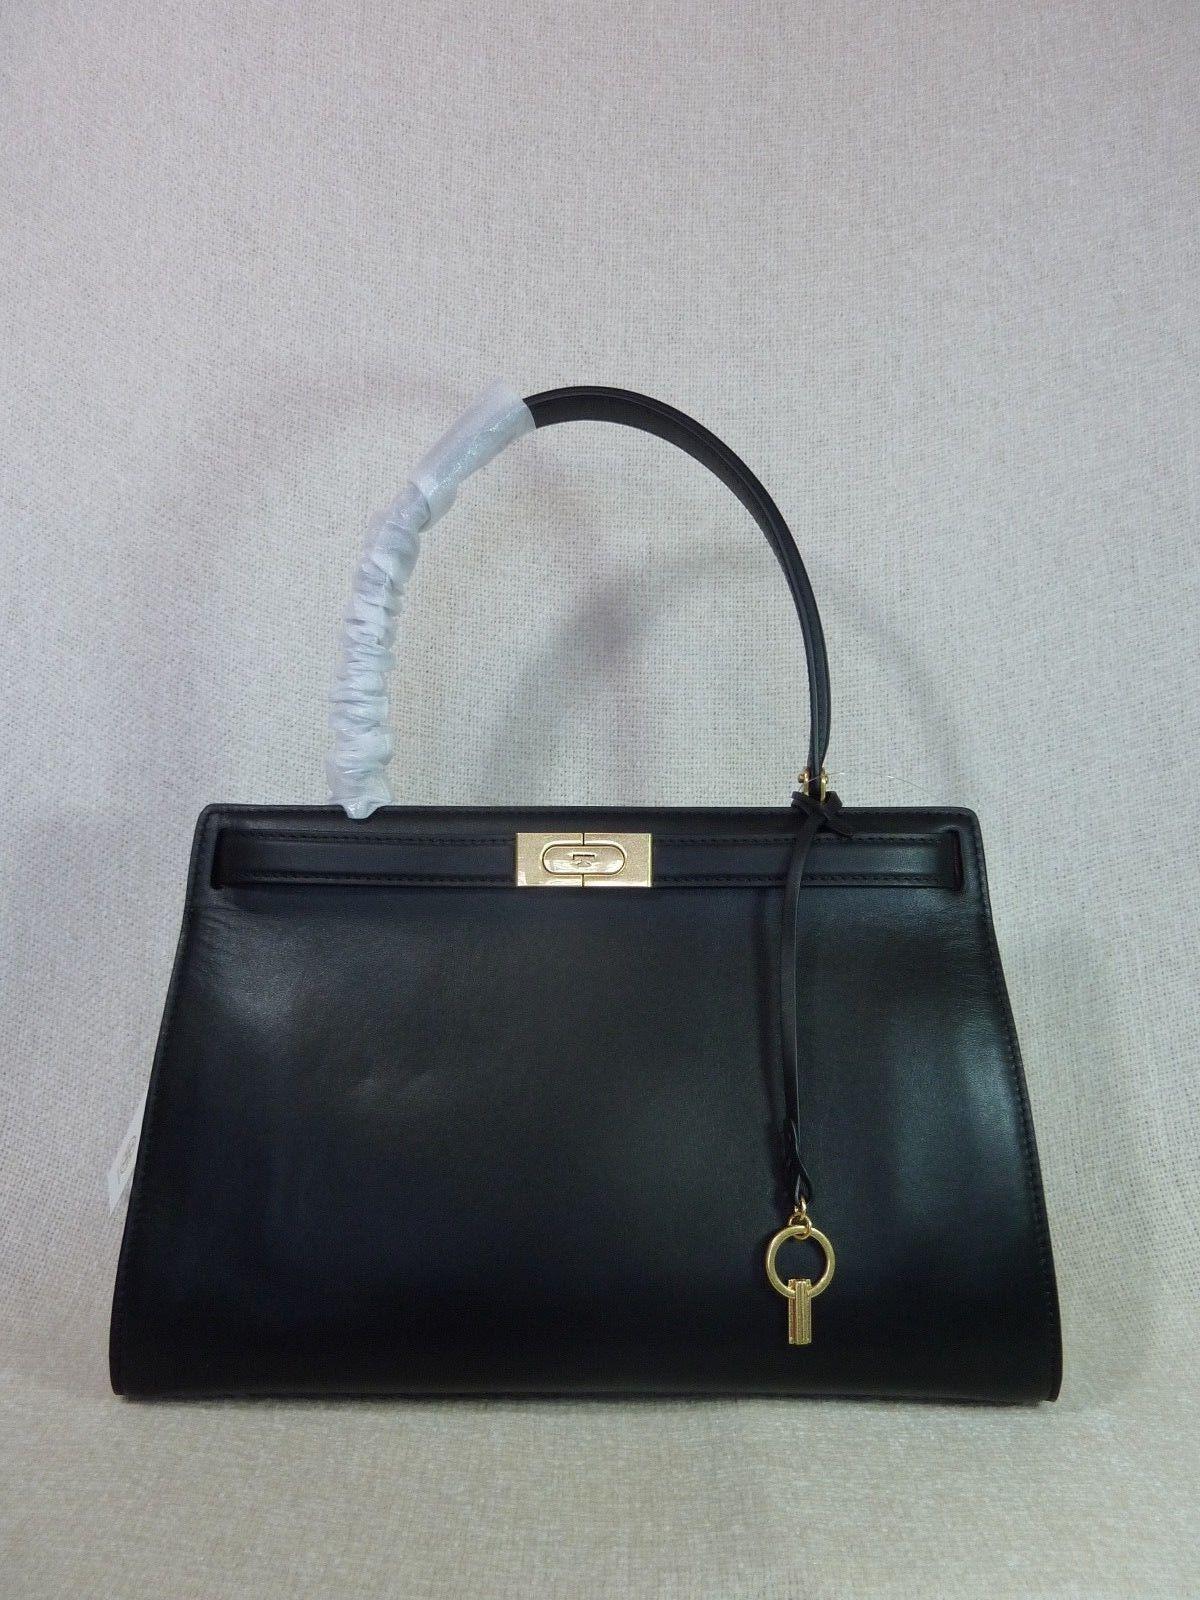 6ed9f862f3cb Nwt Tory Burch Black Leather Lee Radziwill and 50 similar items